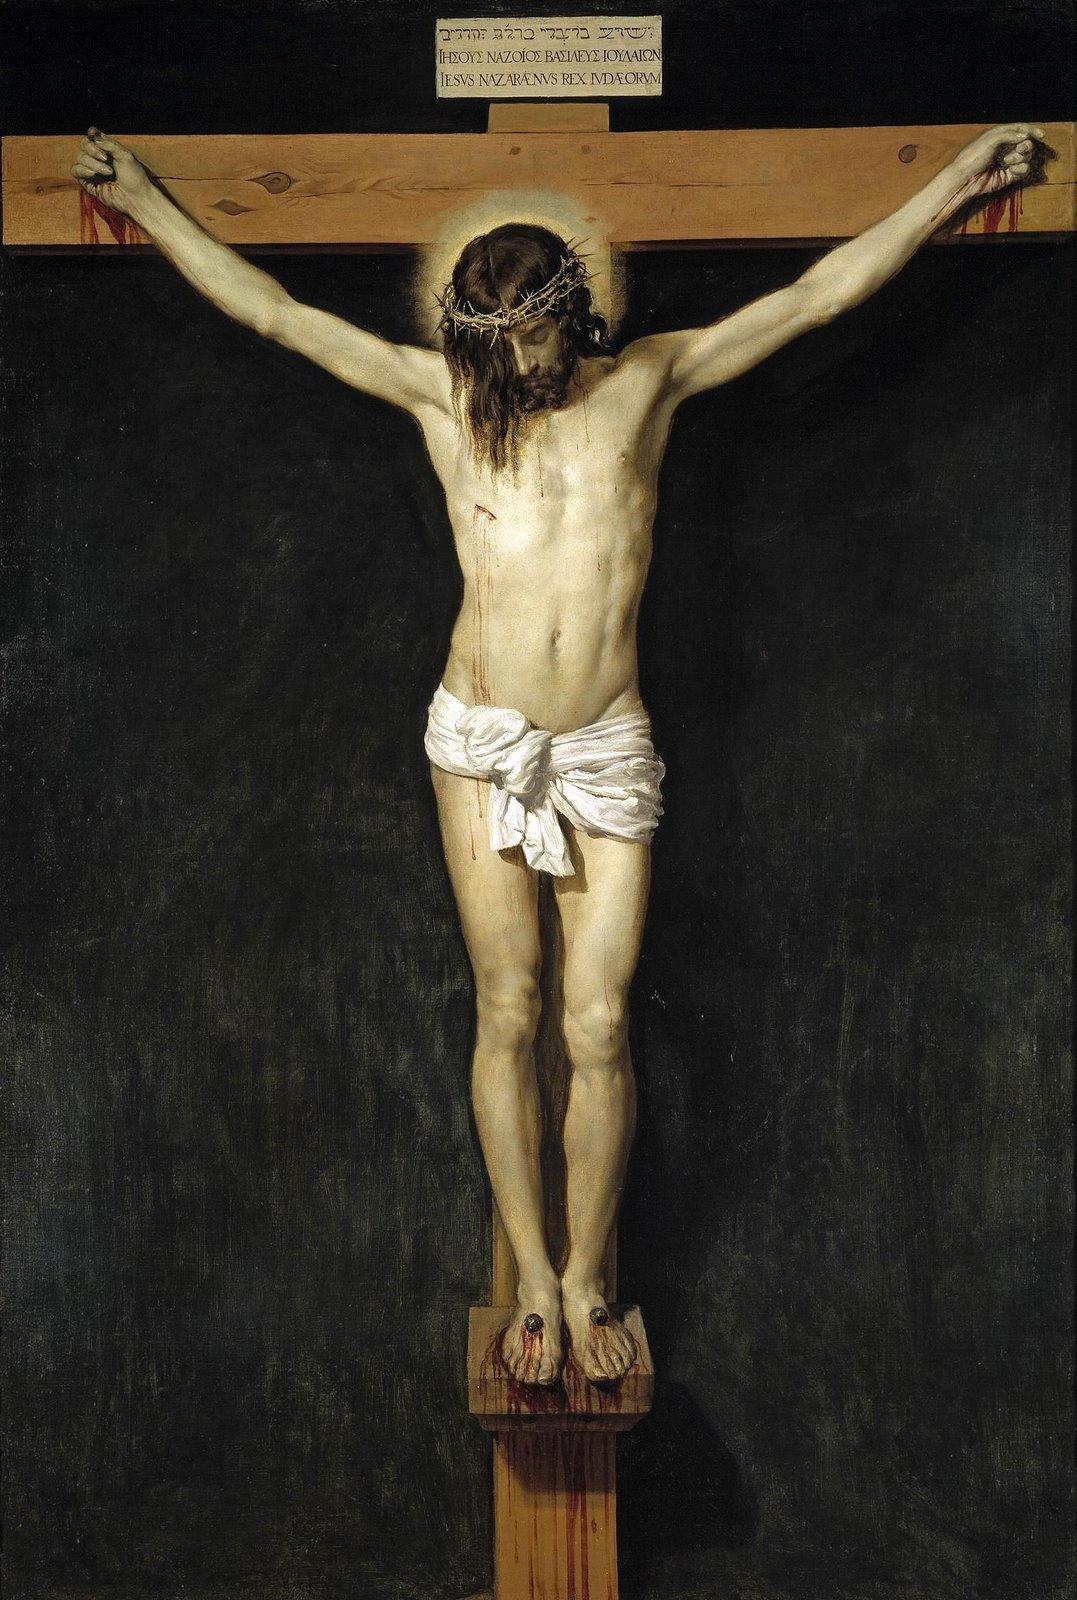 Christ Crucified, Diego Velázquez, c. 1632